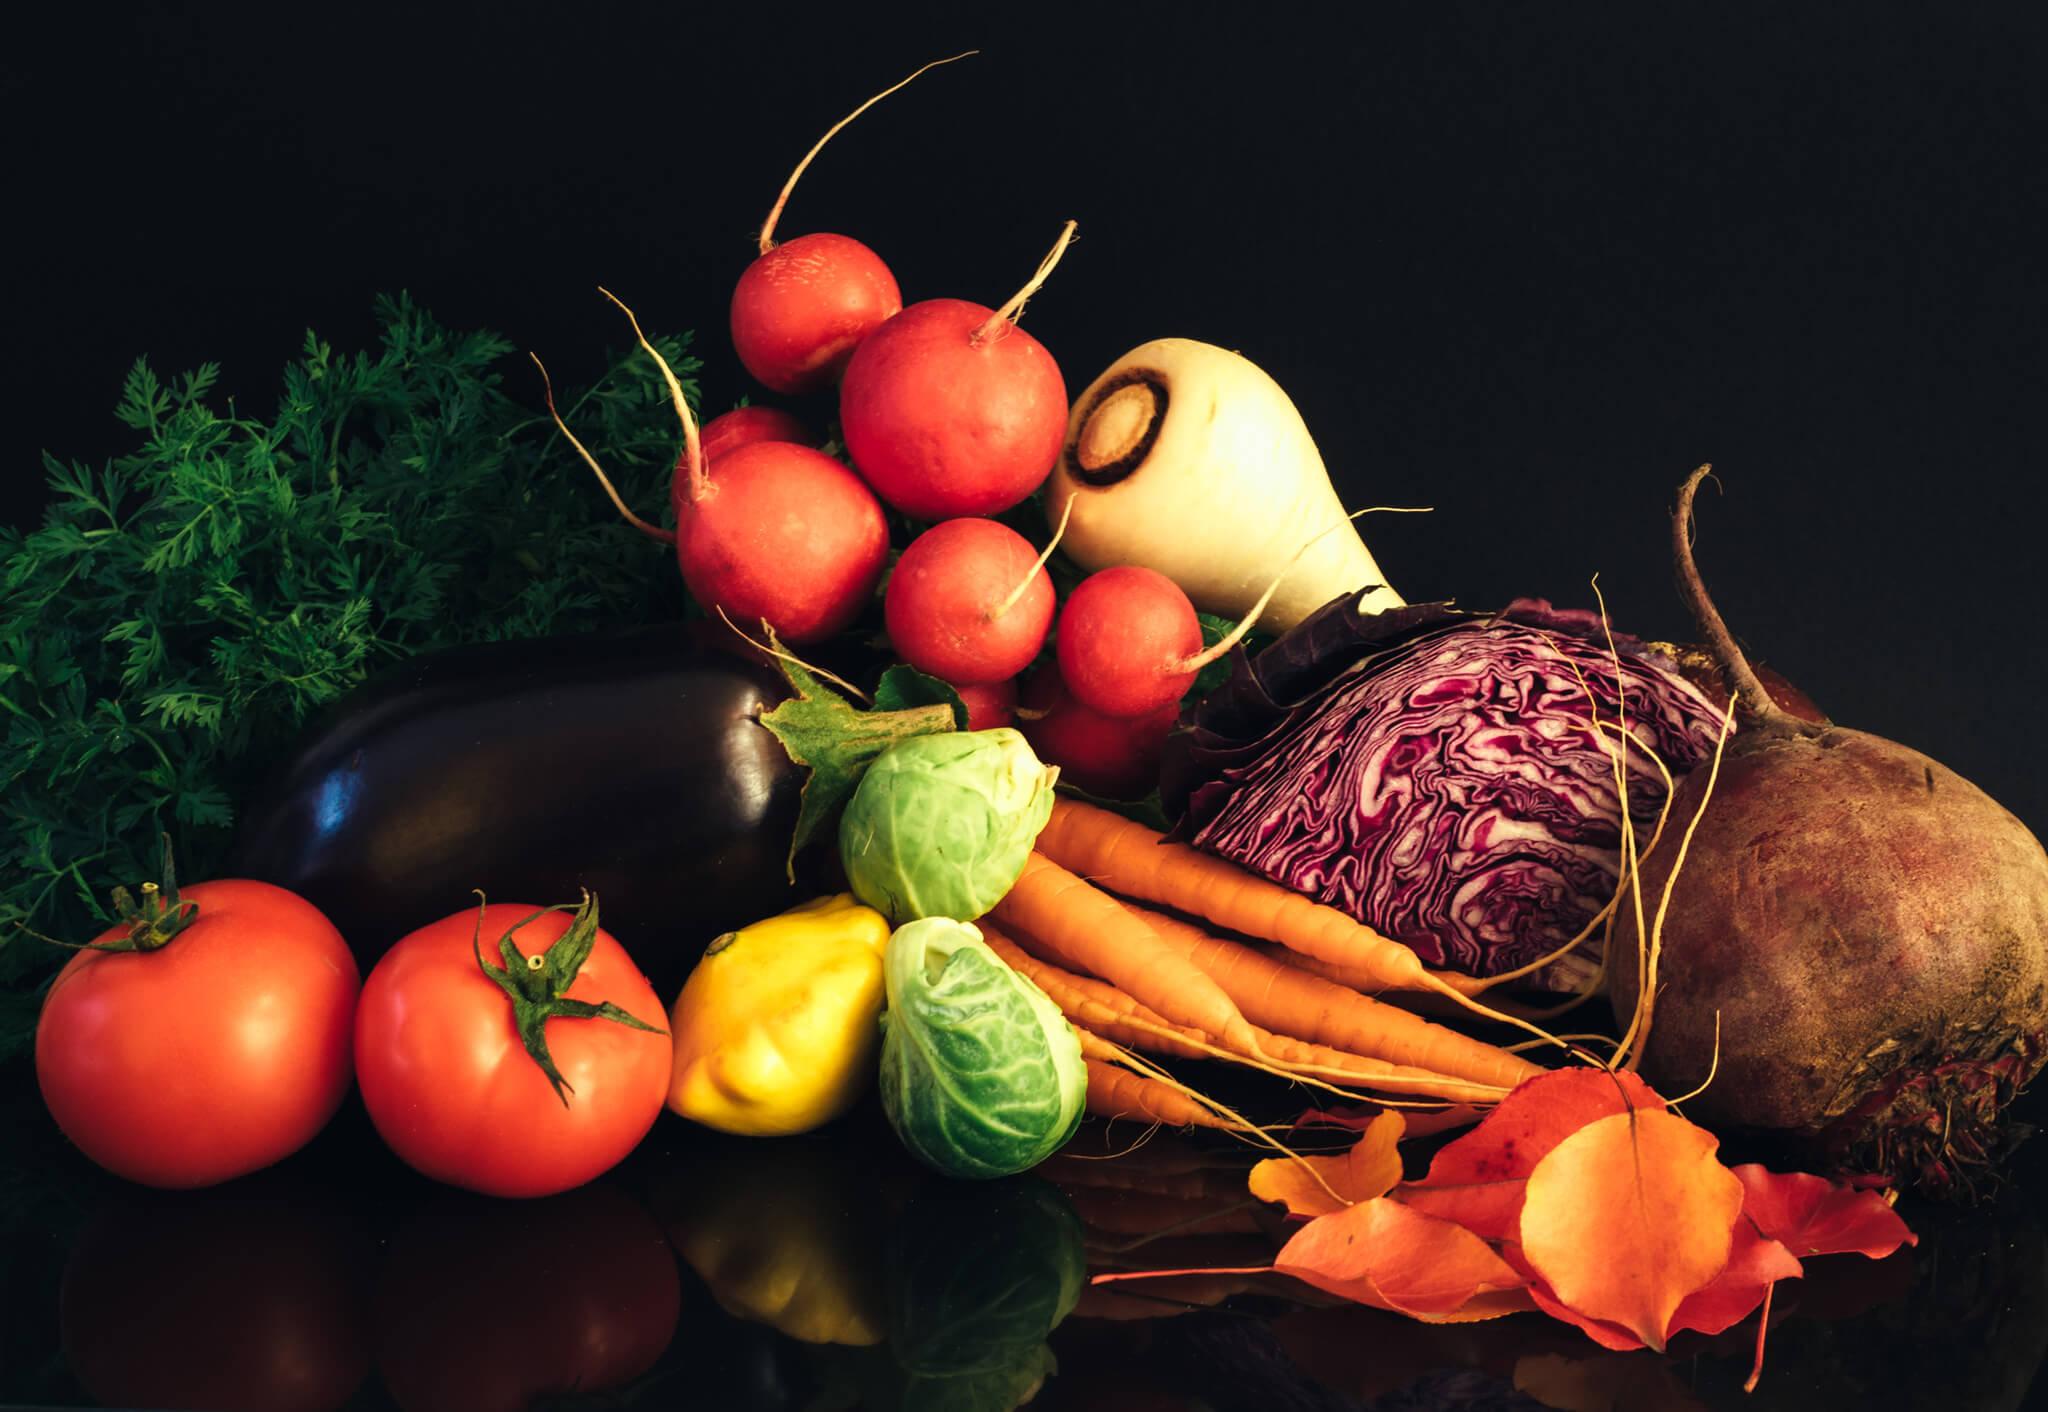 Organic. Good for you.